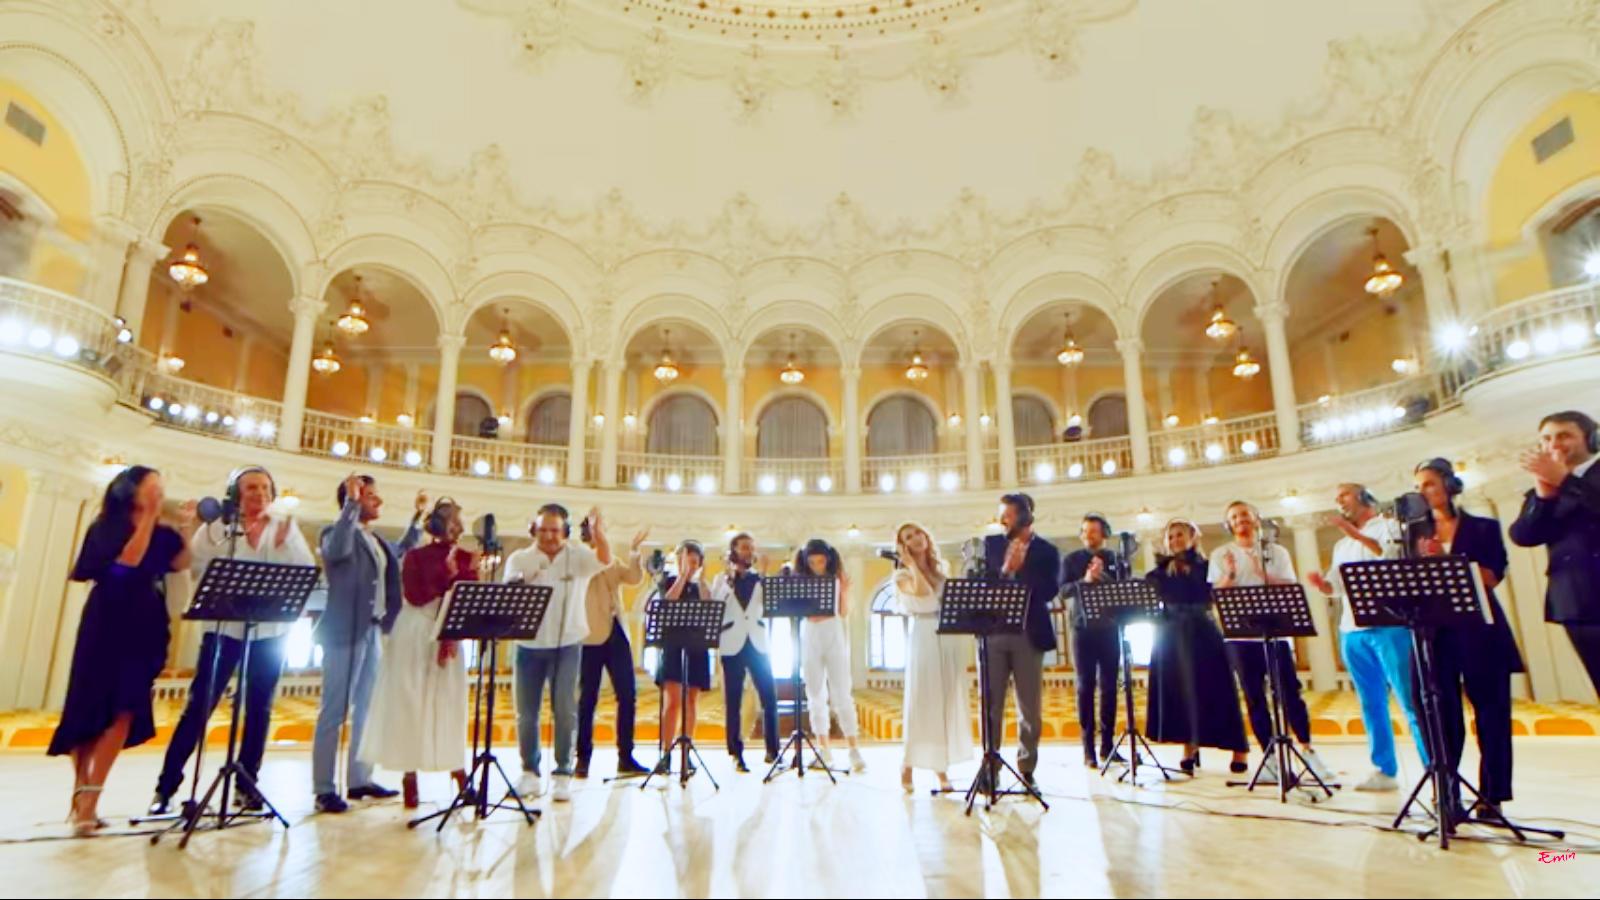 Azərbaycan! Mən səni sevirəm! – грандиозный проект Эмина Агаларова с участием оперных и эстрадных звезд (ВИДЕО)